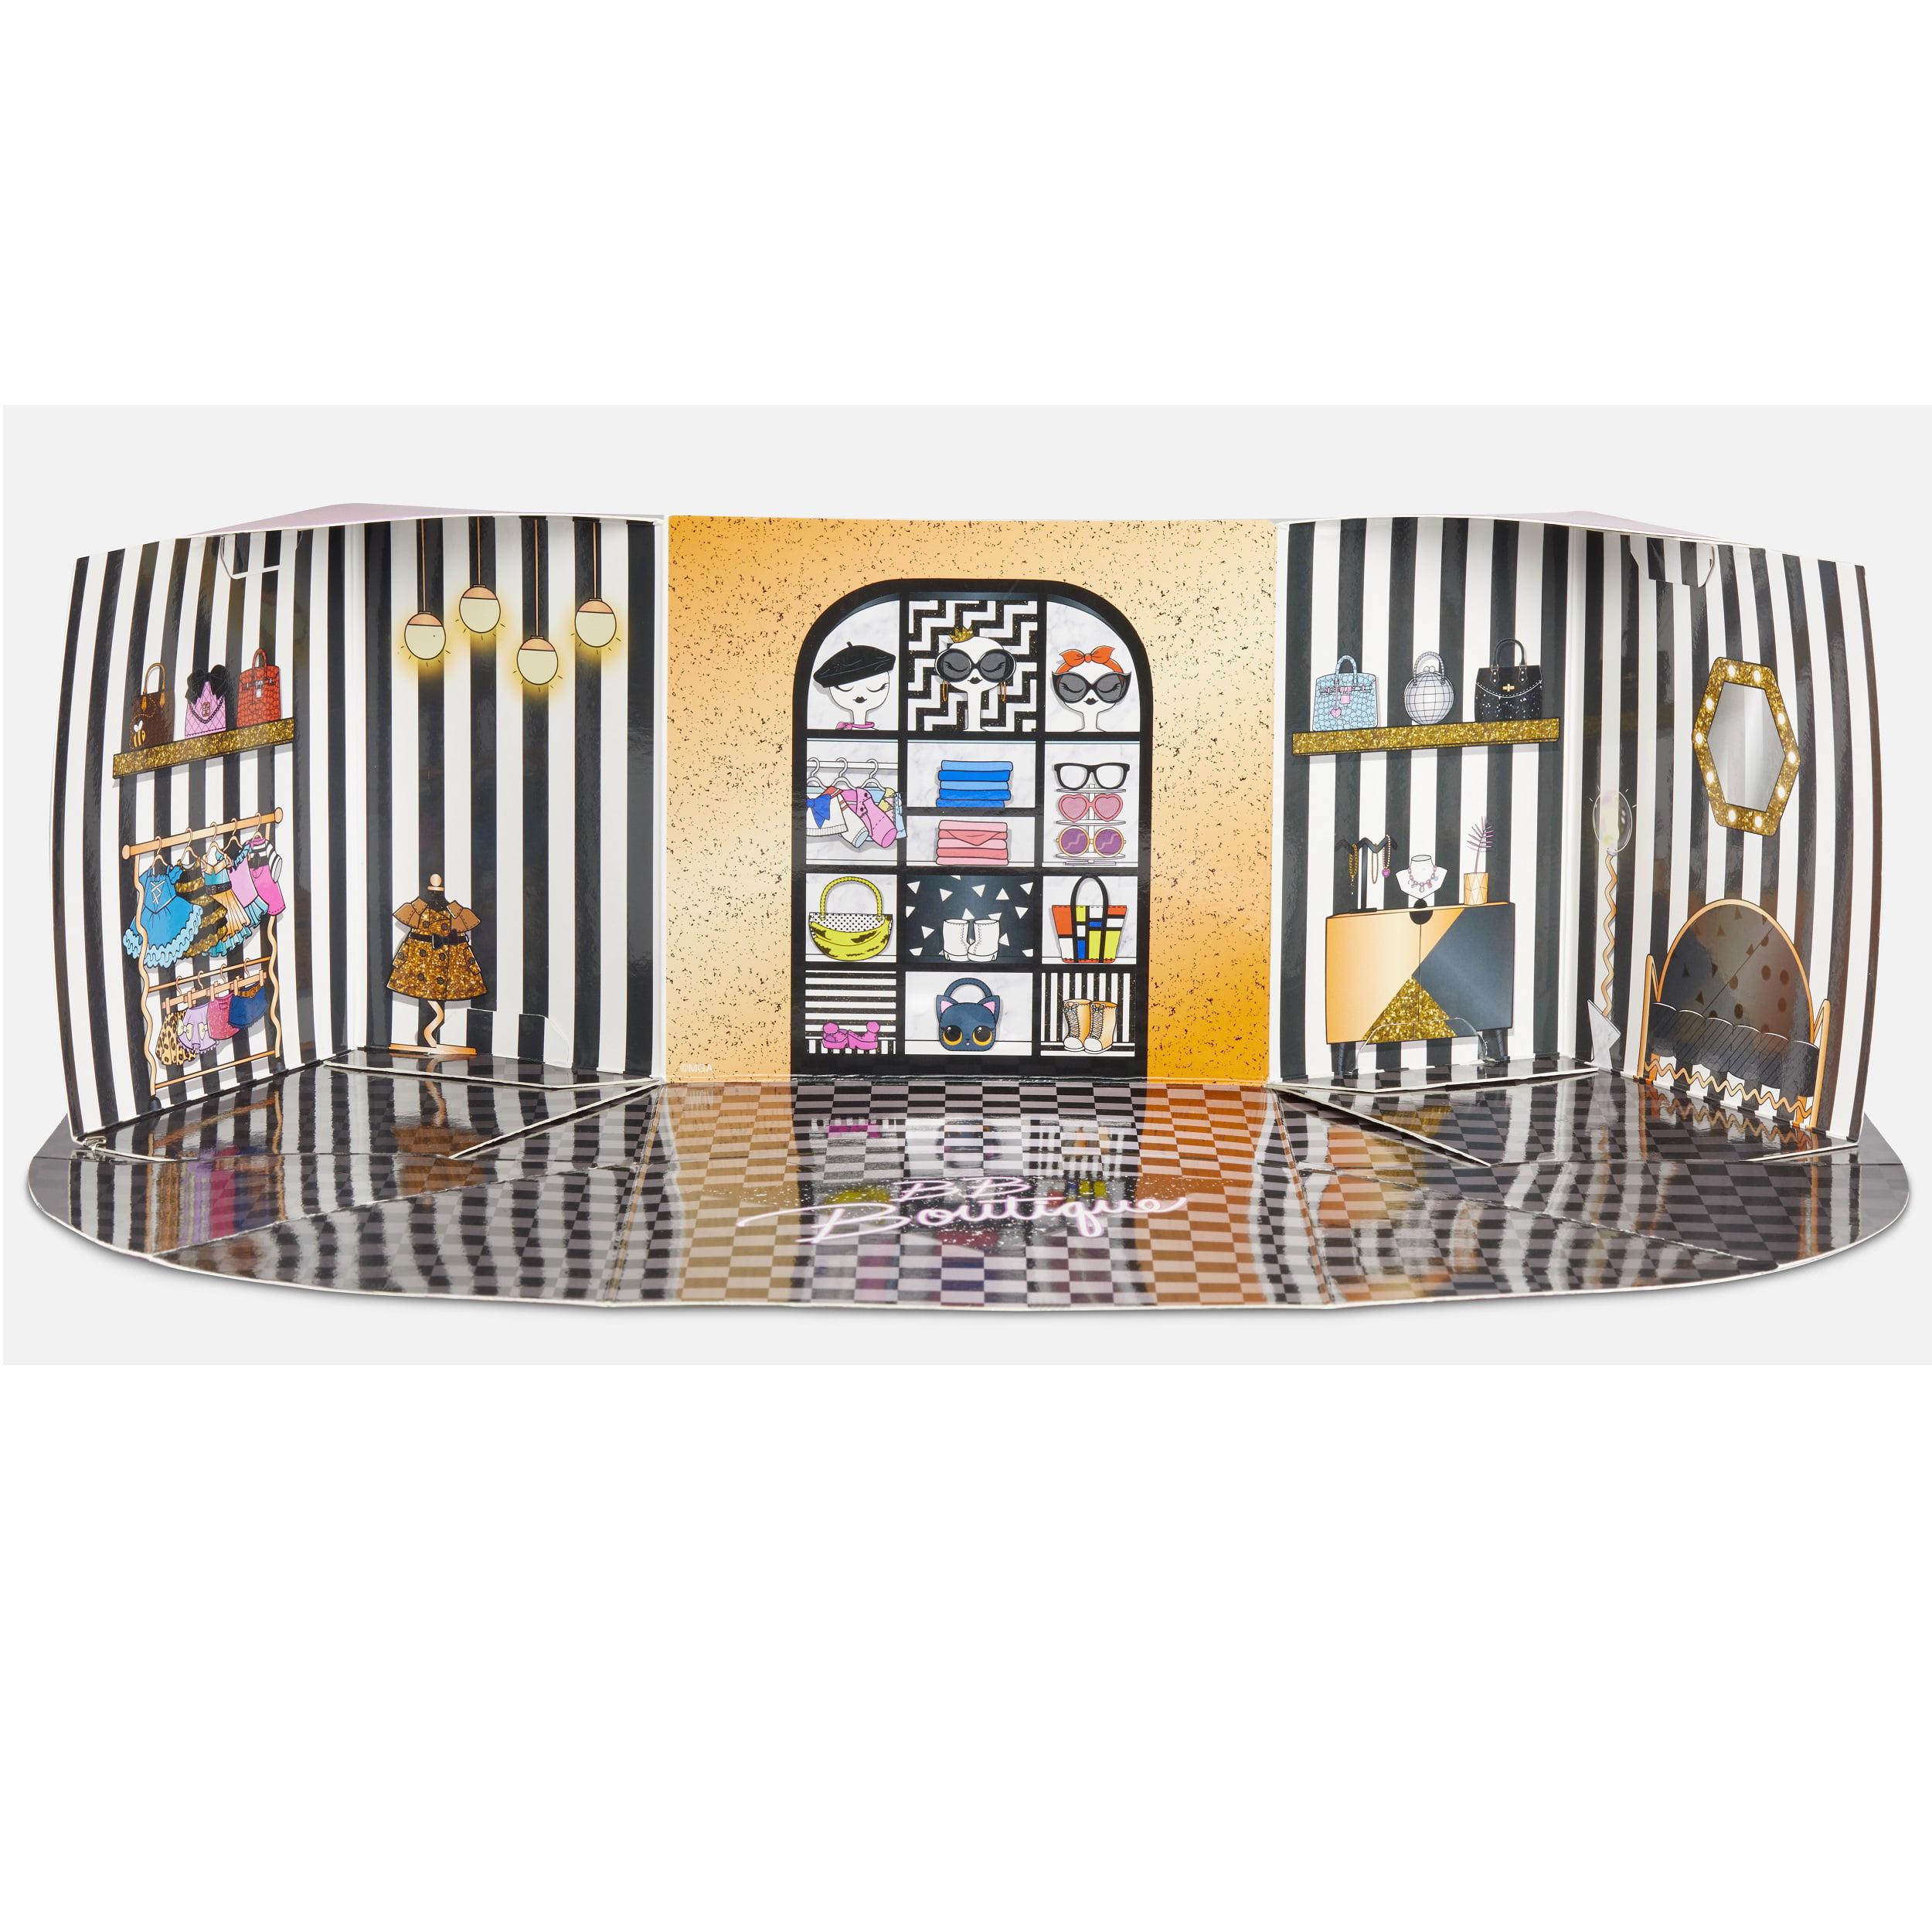 Tv Dvd Meubel.L O L Surprise Furniture Boutique With Queen Bee 10 Surprises